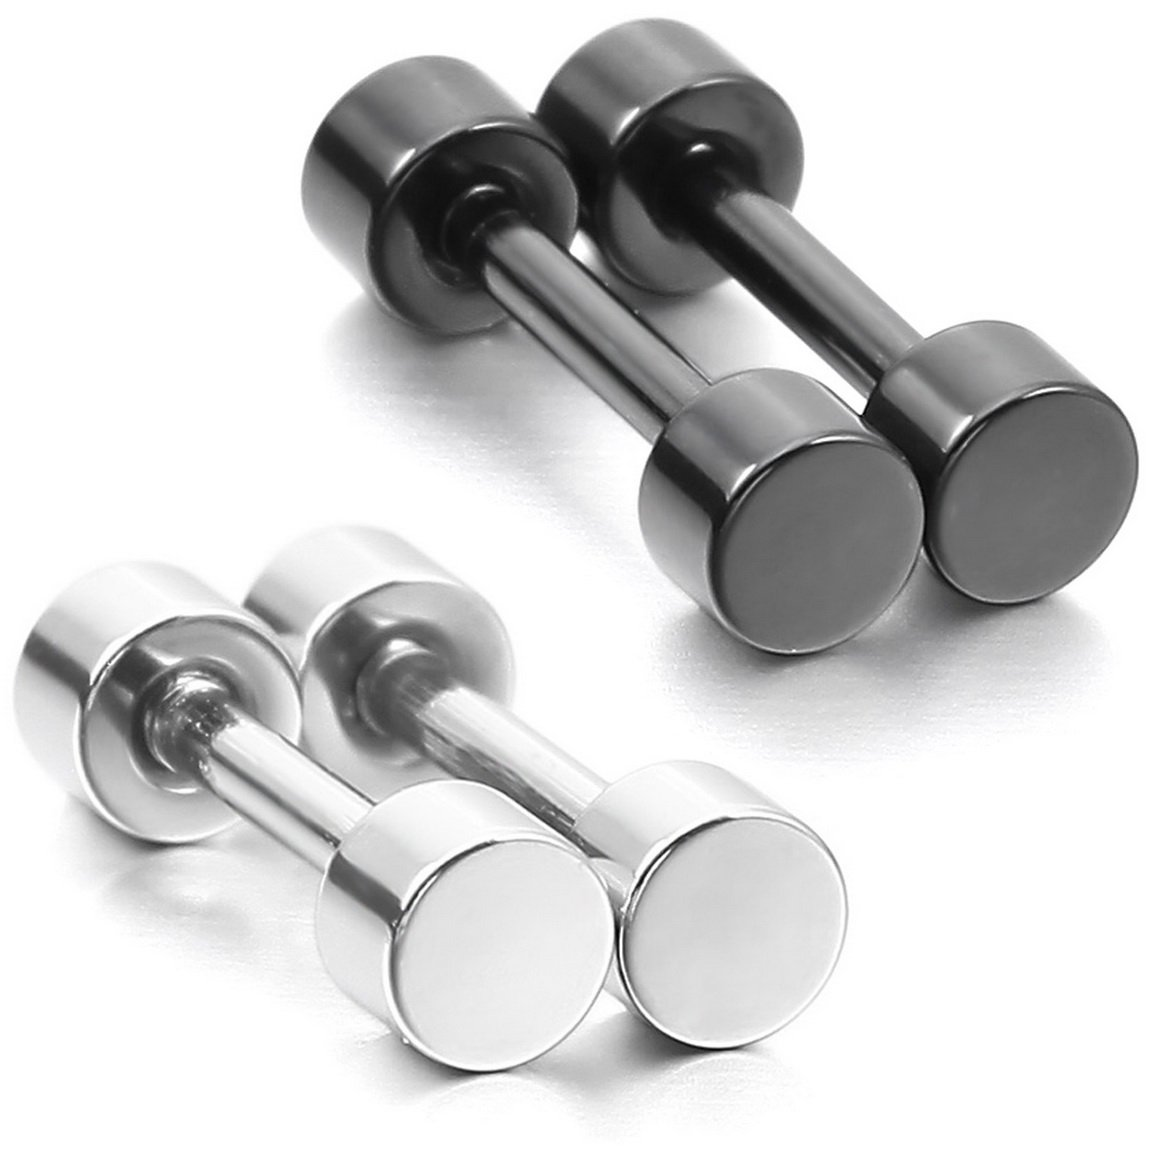 INBLUE Men,Women's 3mm 4 PCS Stainless Steel Stud Earrings Silver Tone Tapers Plugs Tunnel Double Side Set (2 Pairs)